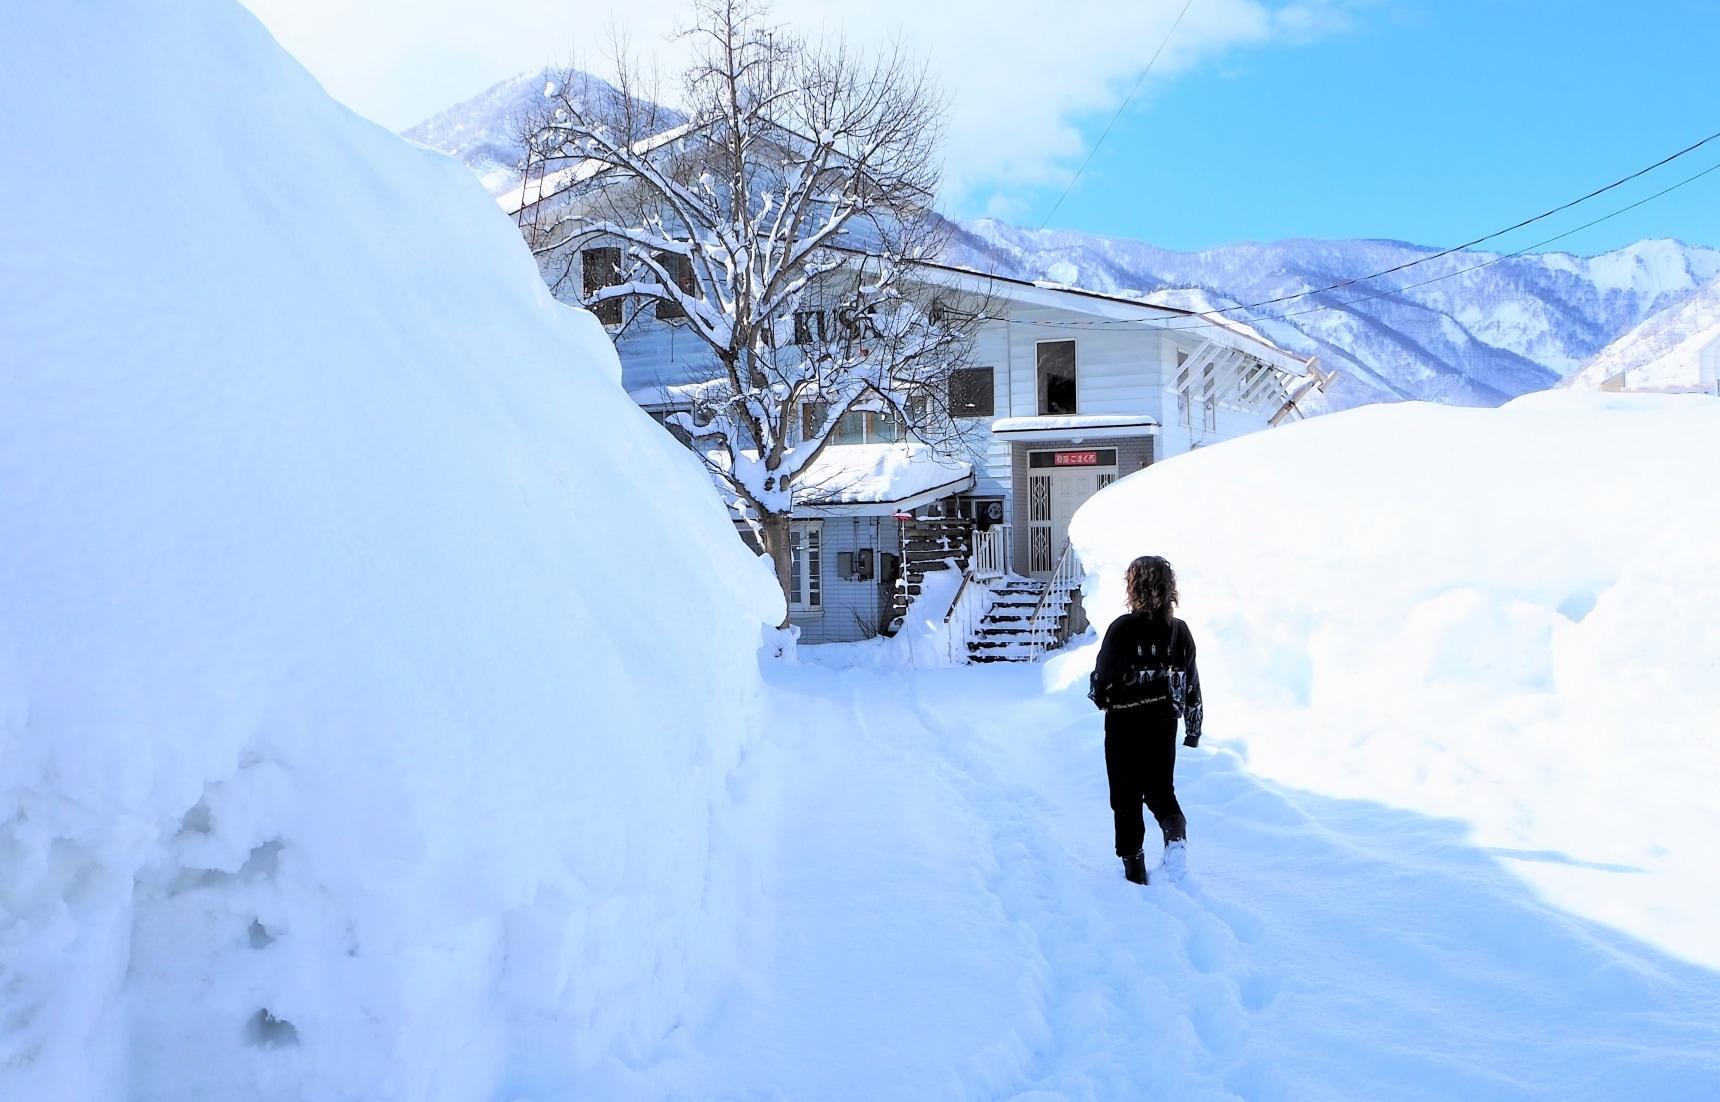 Deep in Snow Country - Yuzawa and Minakami